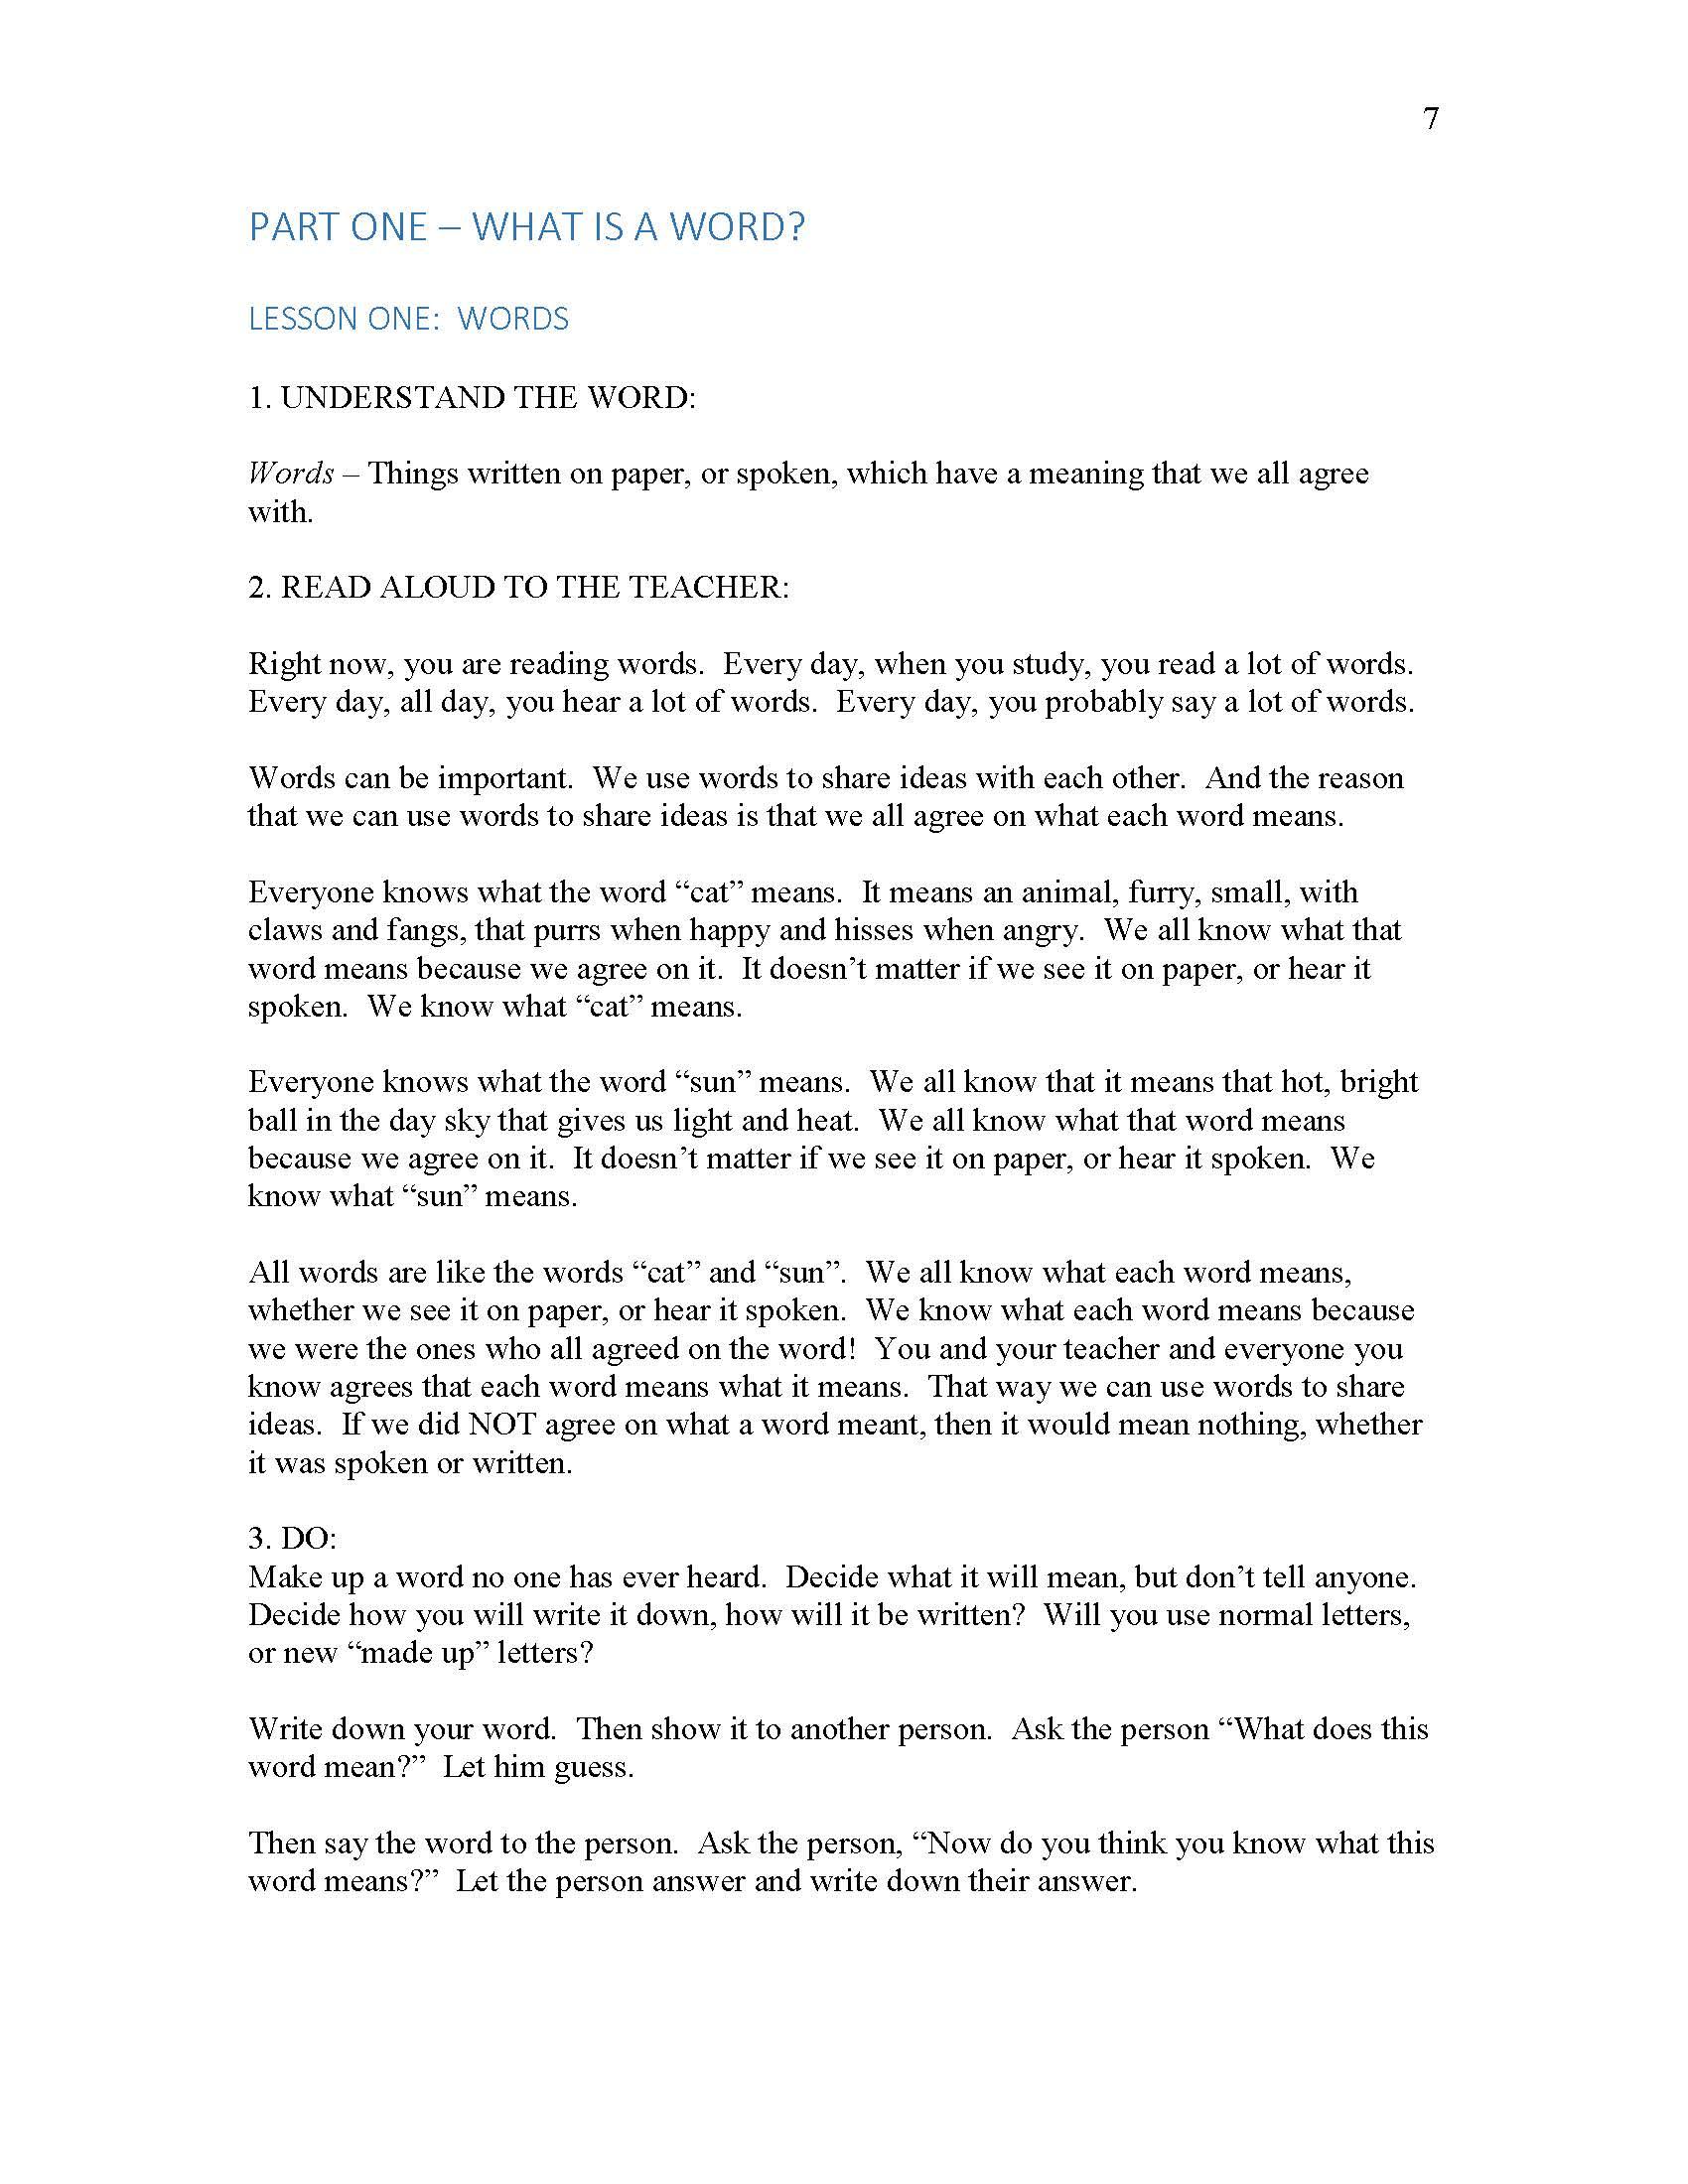 Samples Step 2 Creative Writing 1_Page_08.jpg